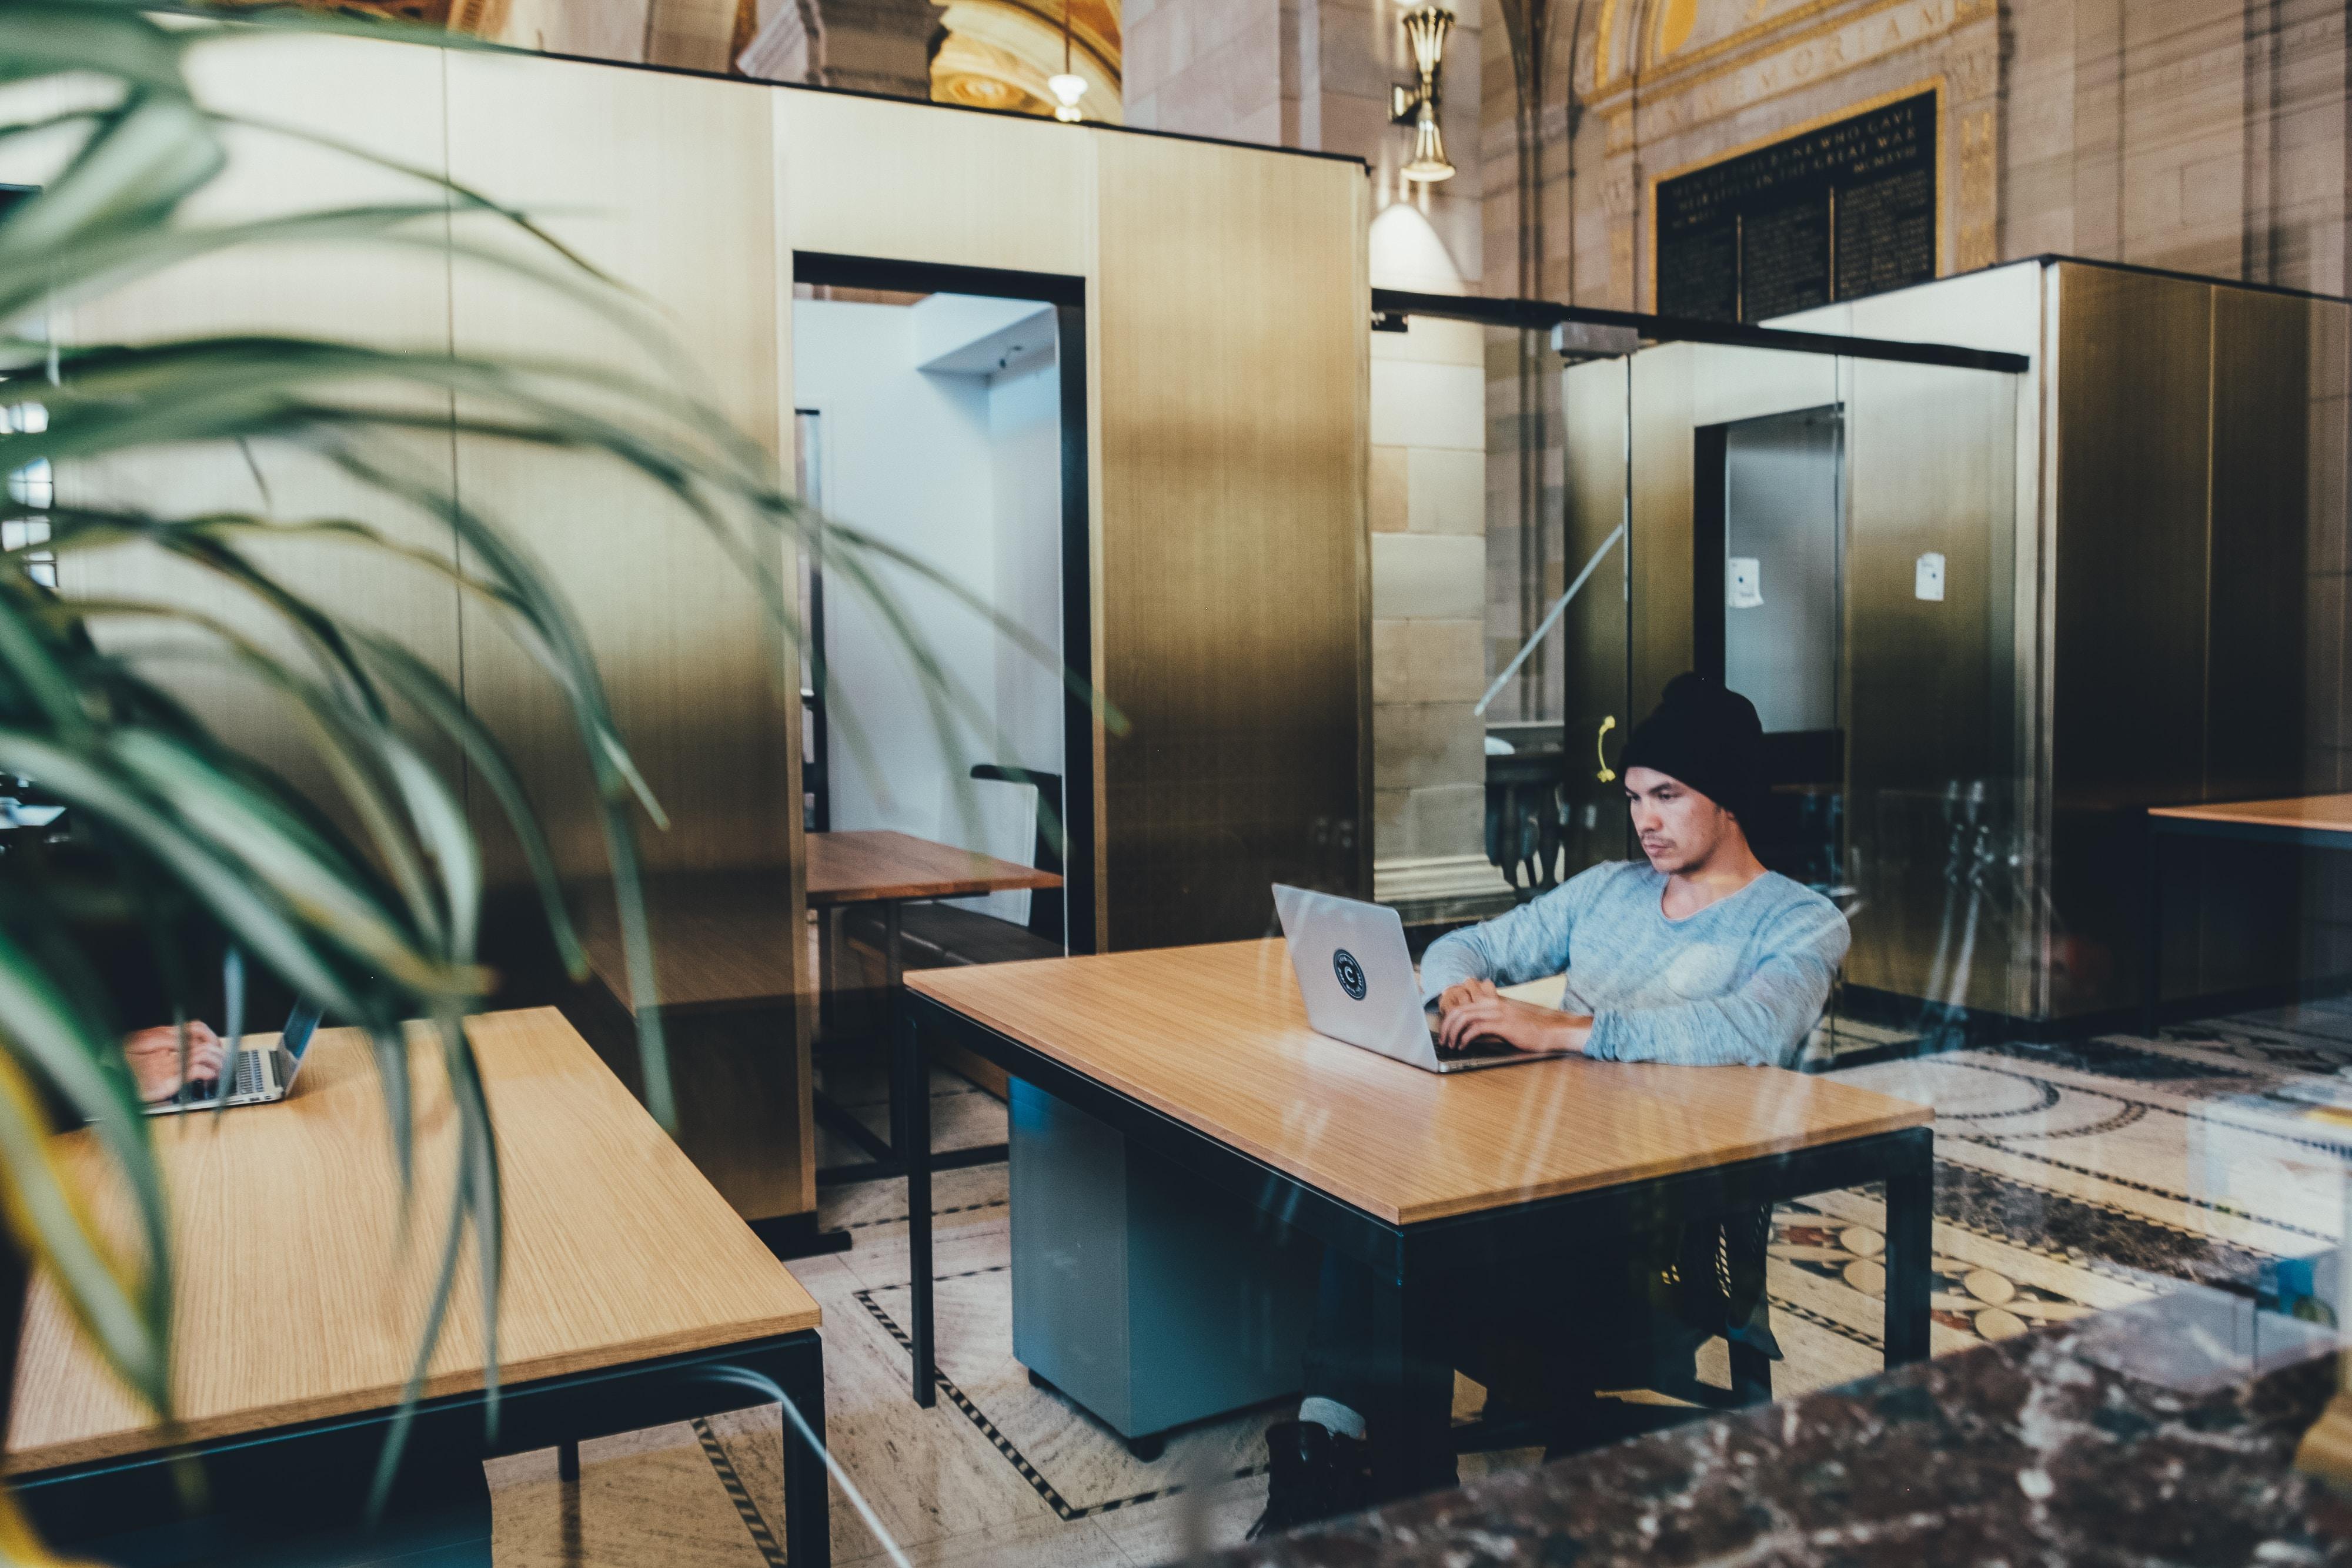 man using a gray laptop computer